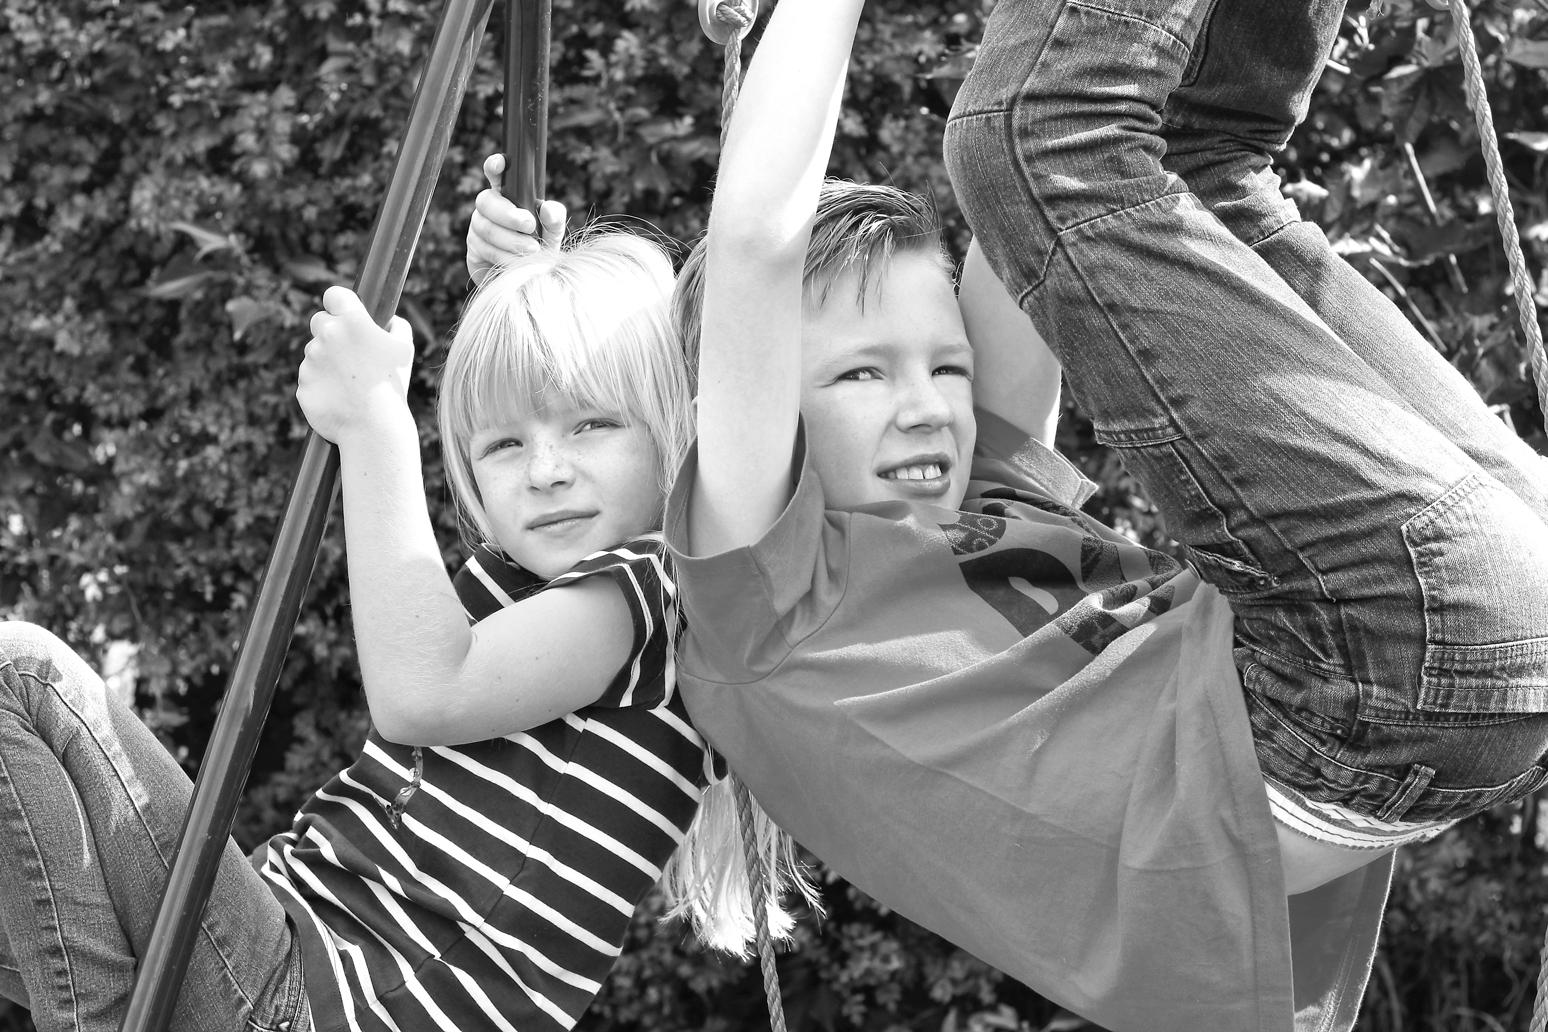 Children in Black & White